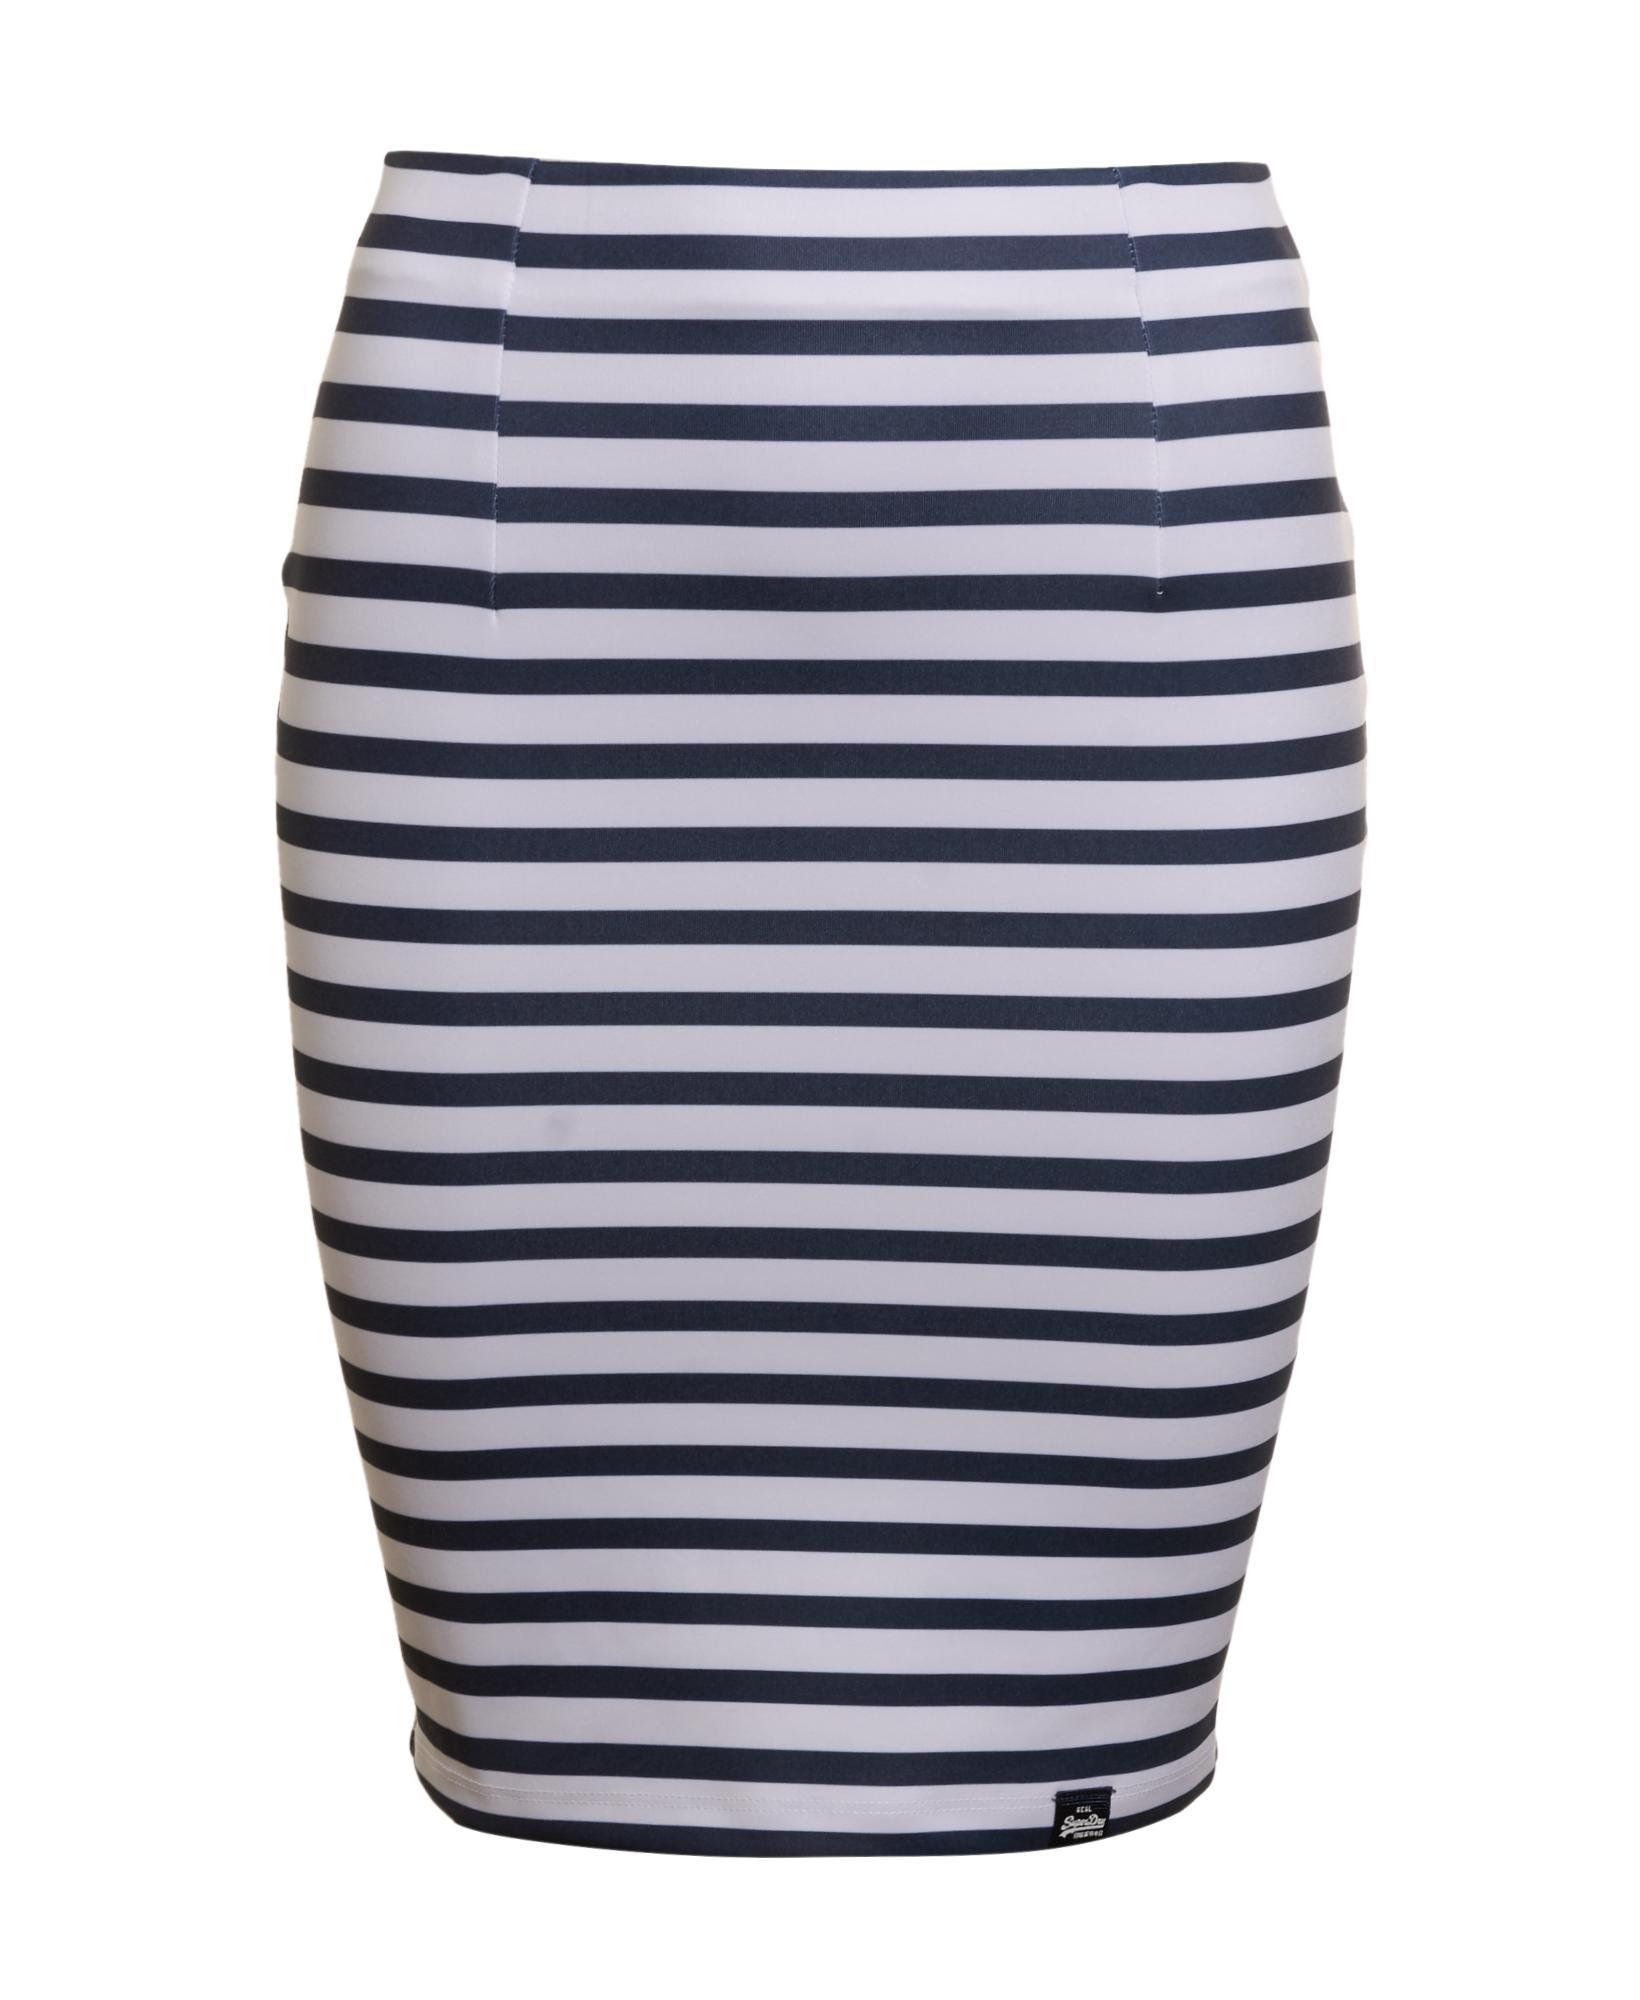 New Womens Superdry Factory Second Premium Scuba Pencil Skirt Navy//White